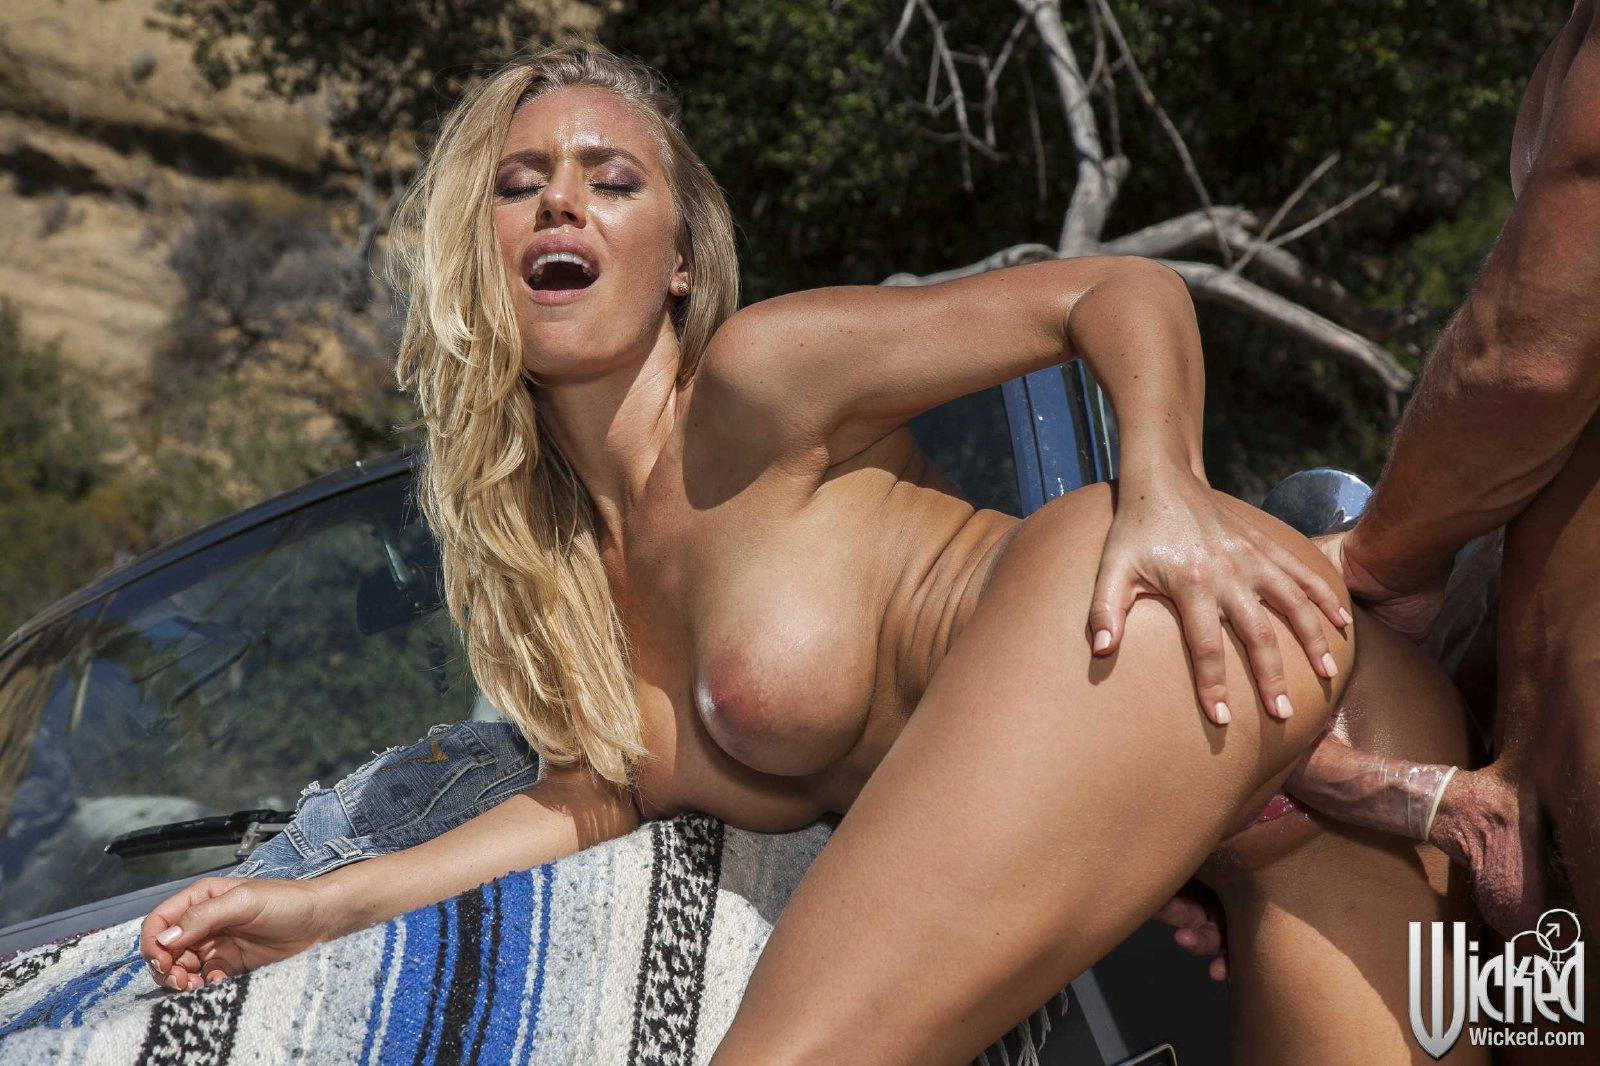 mypornstarbook net pornstars n nicole aniston gallery51 08